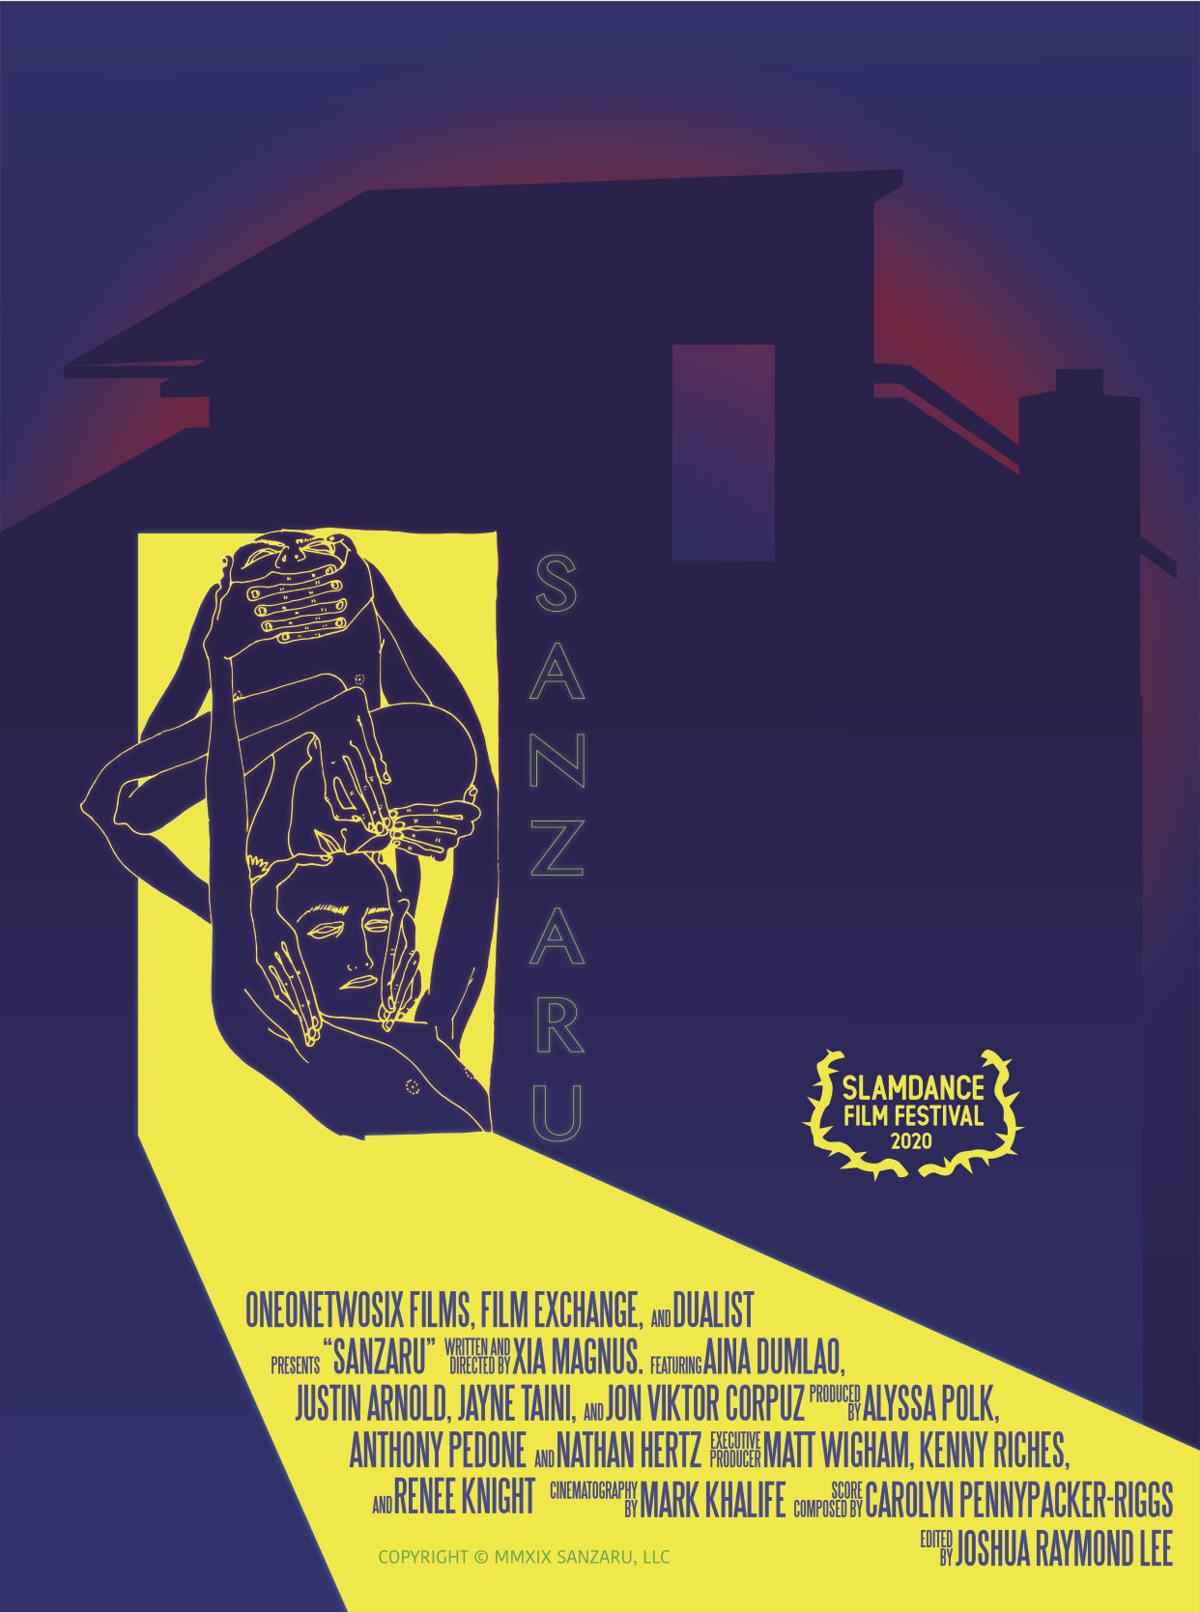 'Sanzaru' movie poster